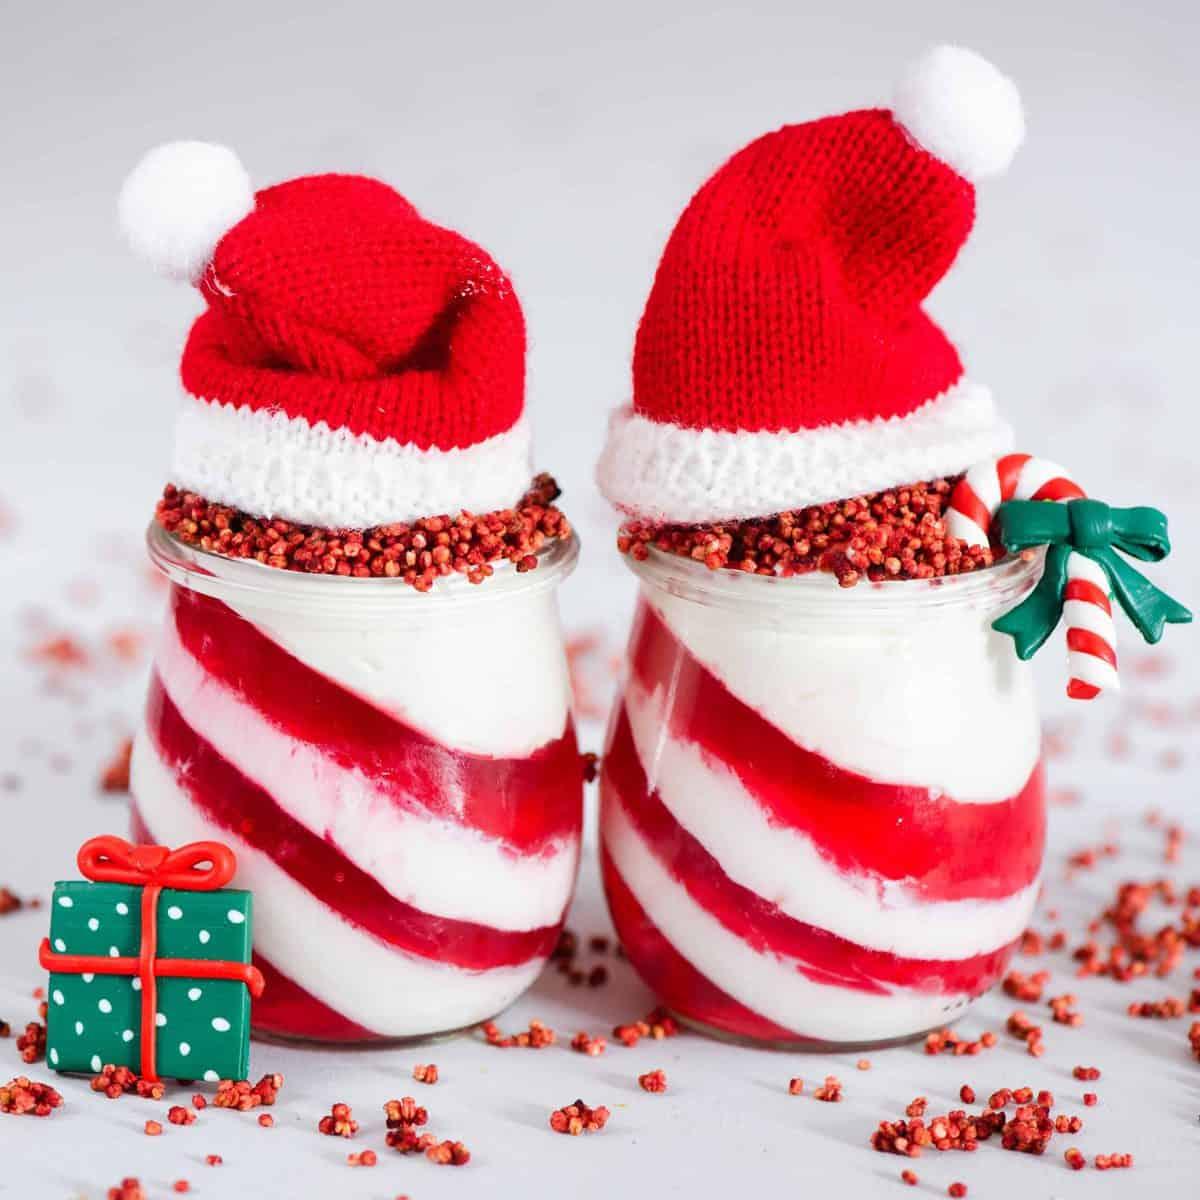 candy cane yogurt and jelly christmas dessert jars. healthy Christmas dessert